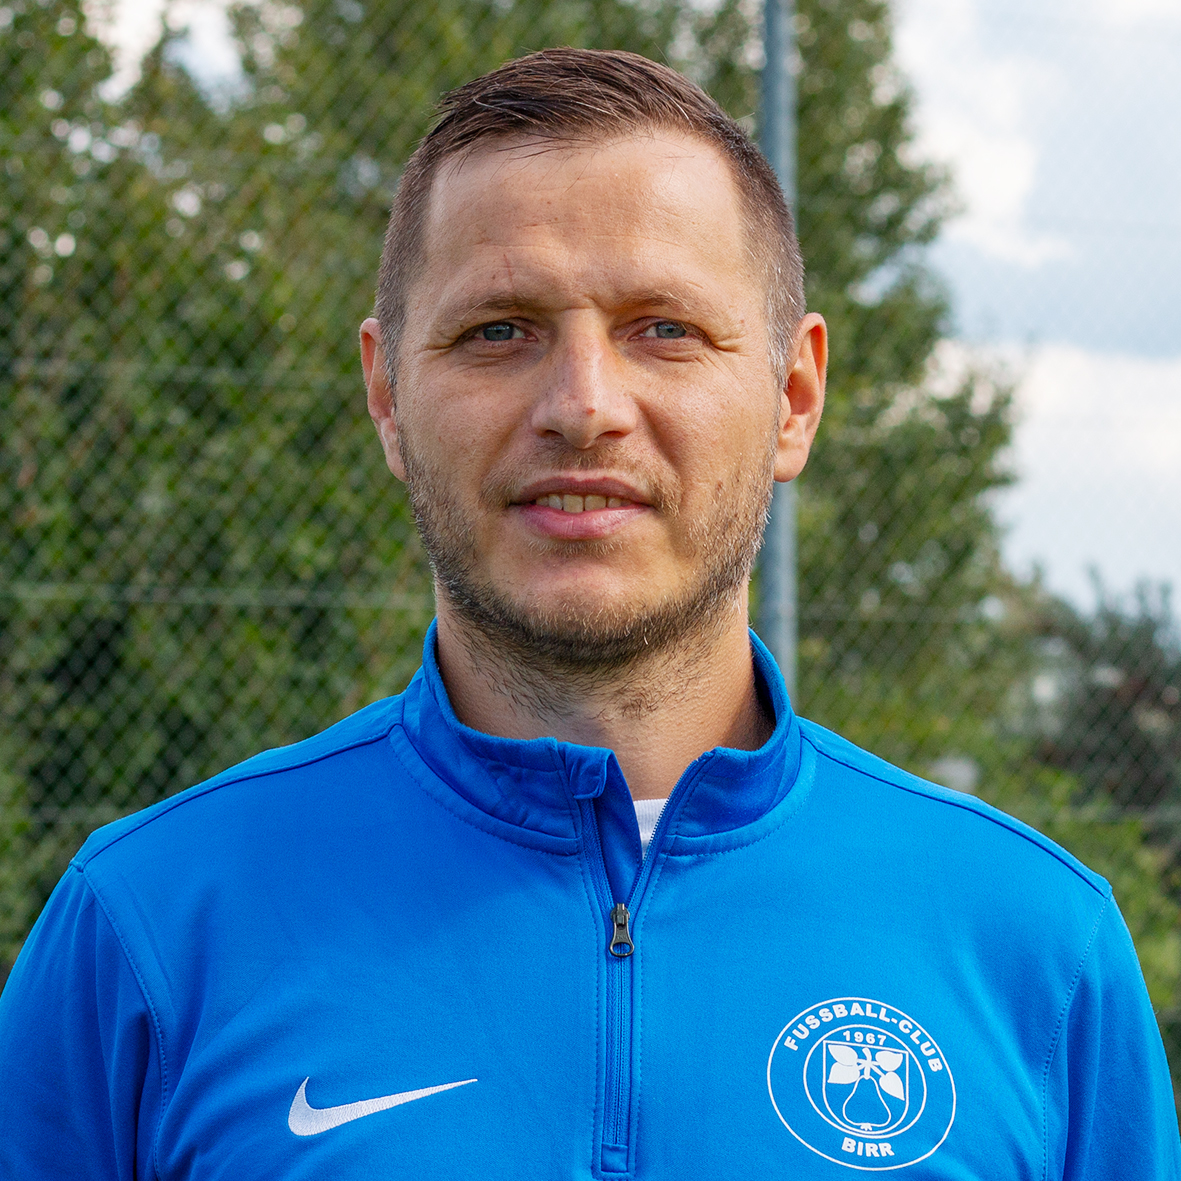 Zoran Micanovic